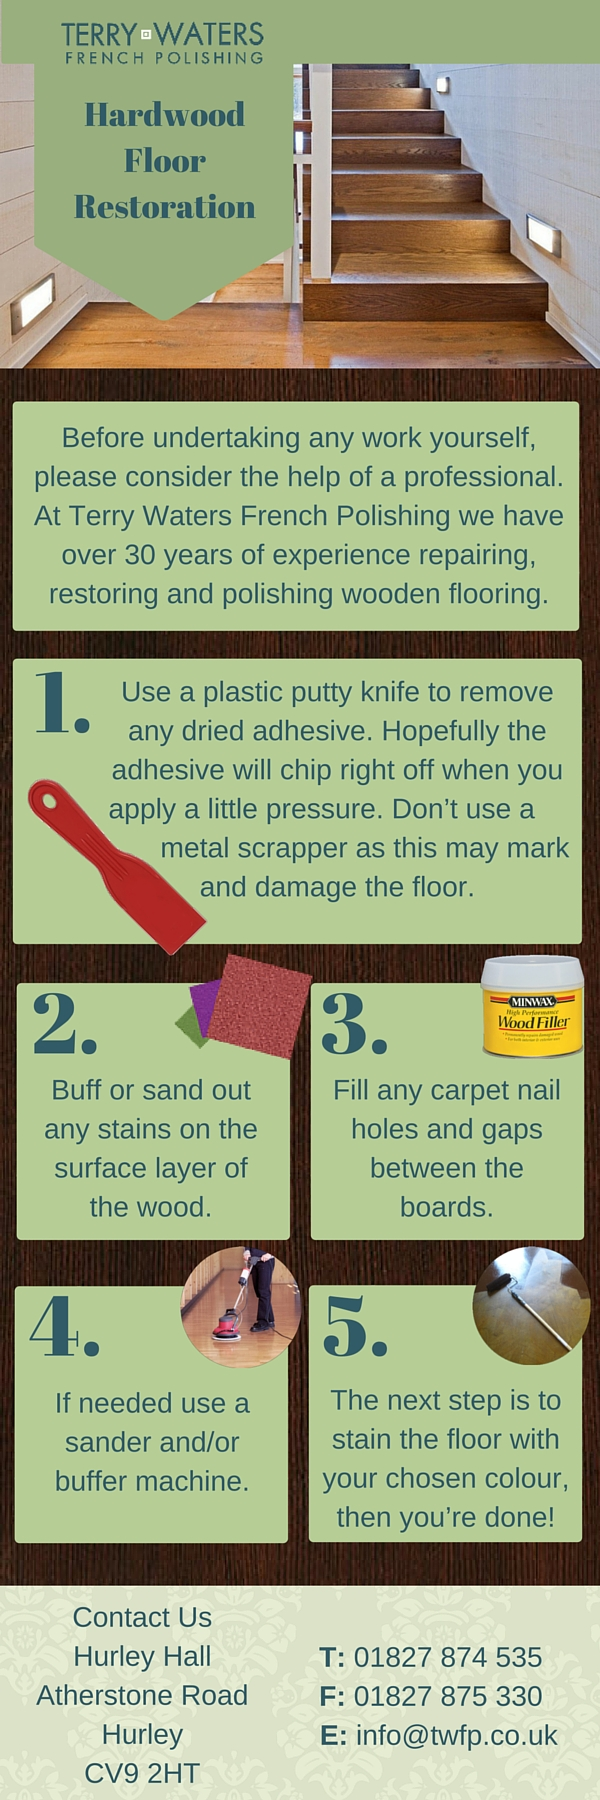 Hardwood Floor Restoration Infographic